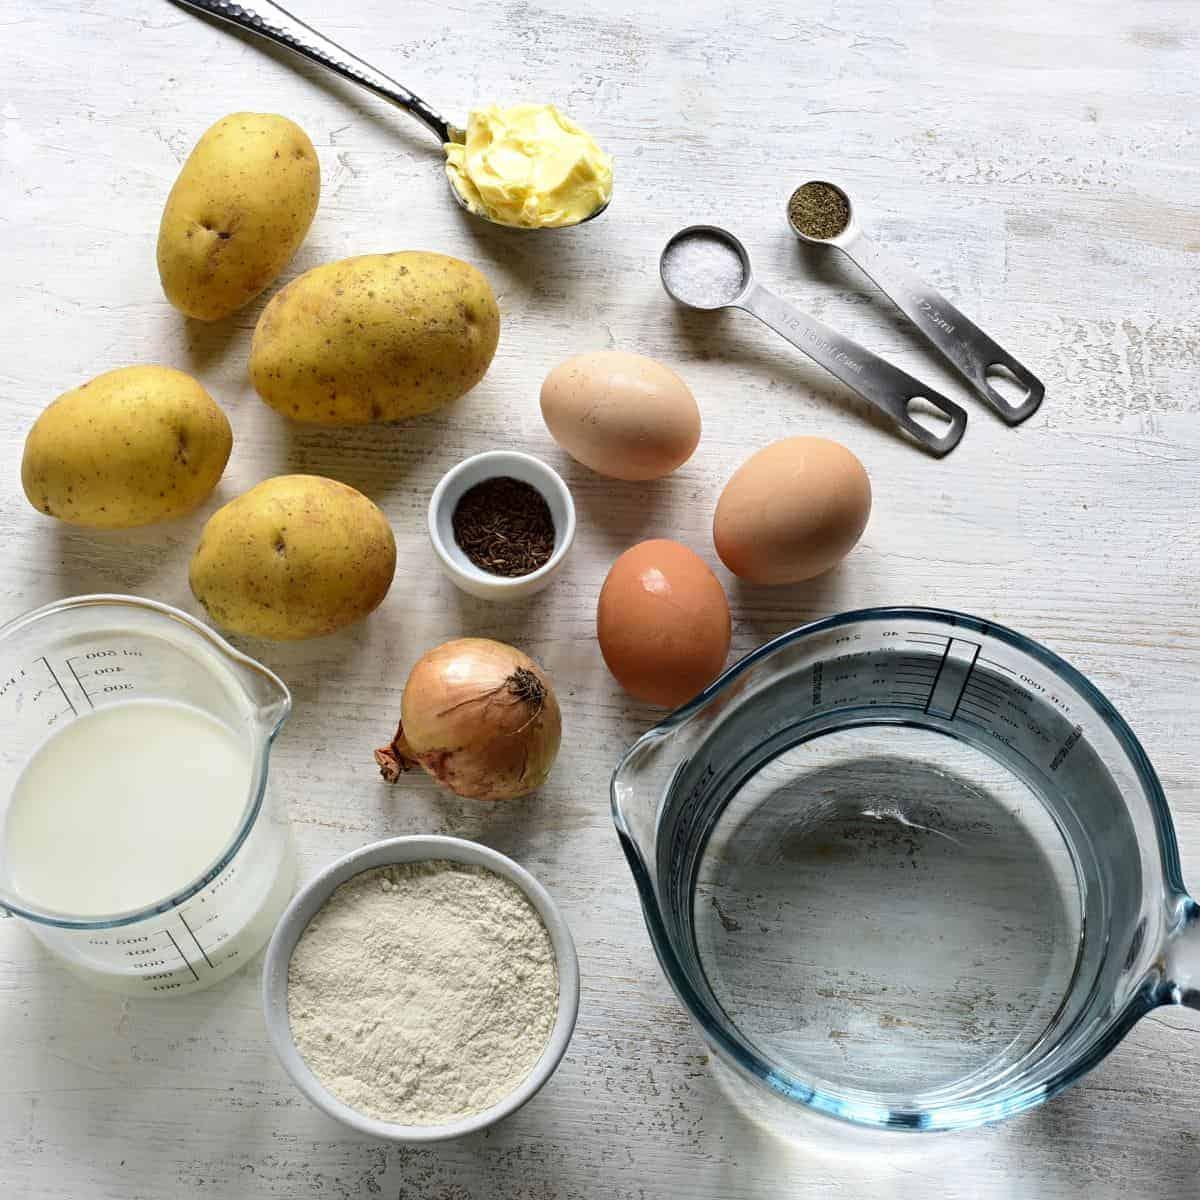 Creamy potato sauce ingredients.